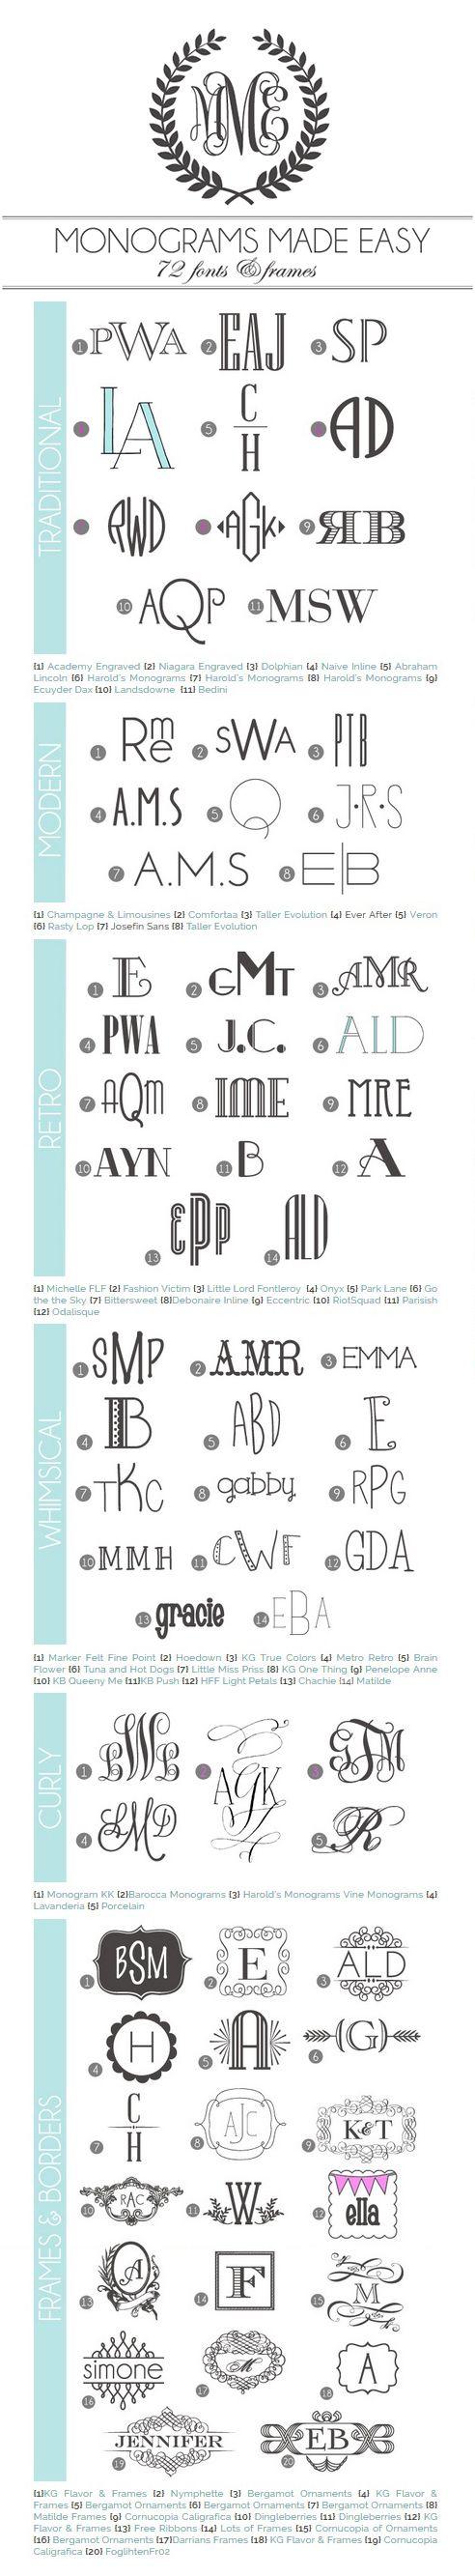 Monograms Made Easy: 72 Fonts & Frames | Marco de monograma ...